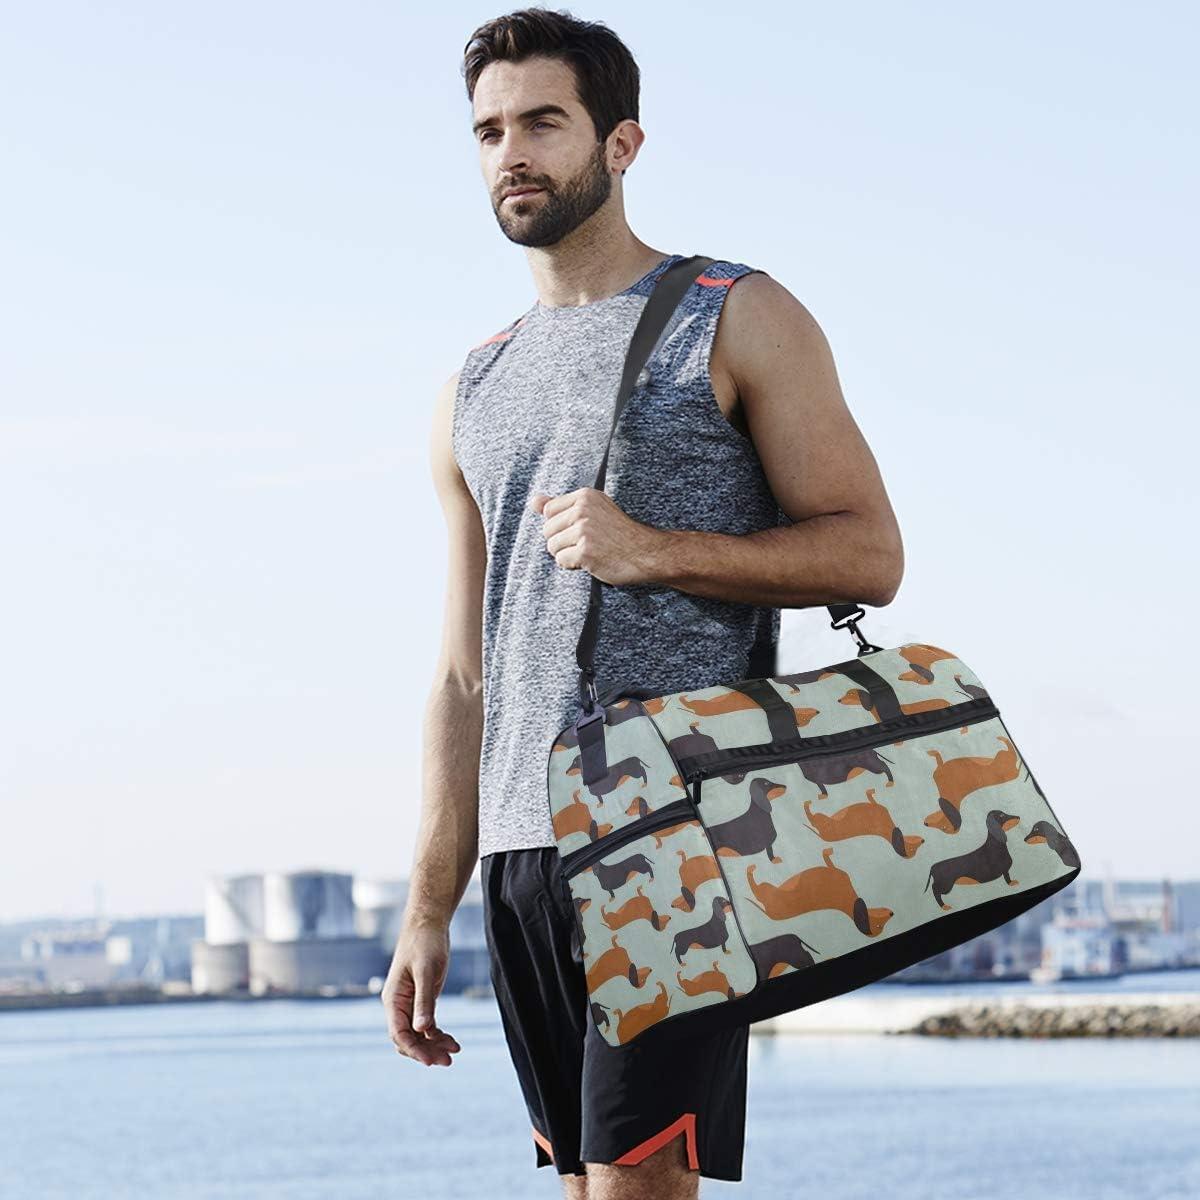 Gym Bag Vintage Dachshund Puppy Dog Duffle Bag Large Sport Casual Fashion Bag for Men Women